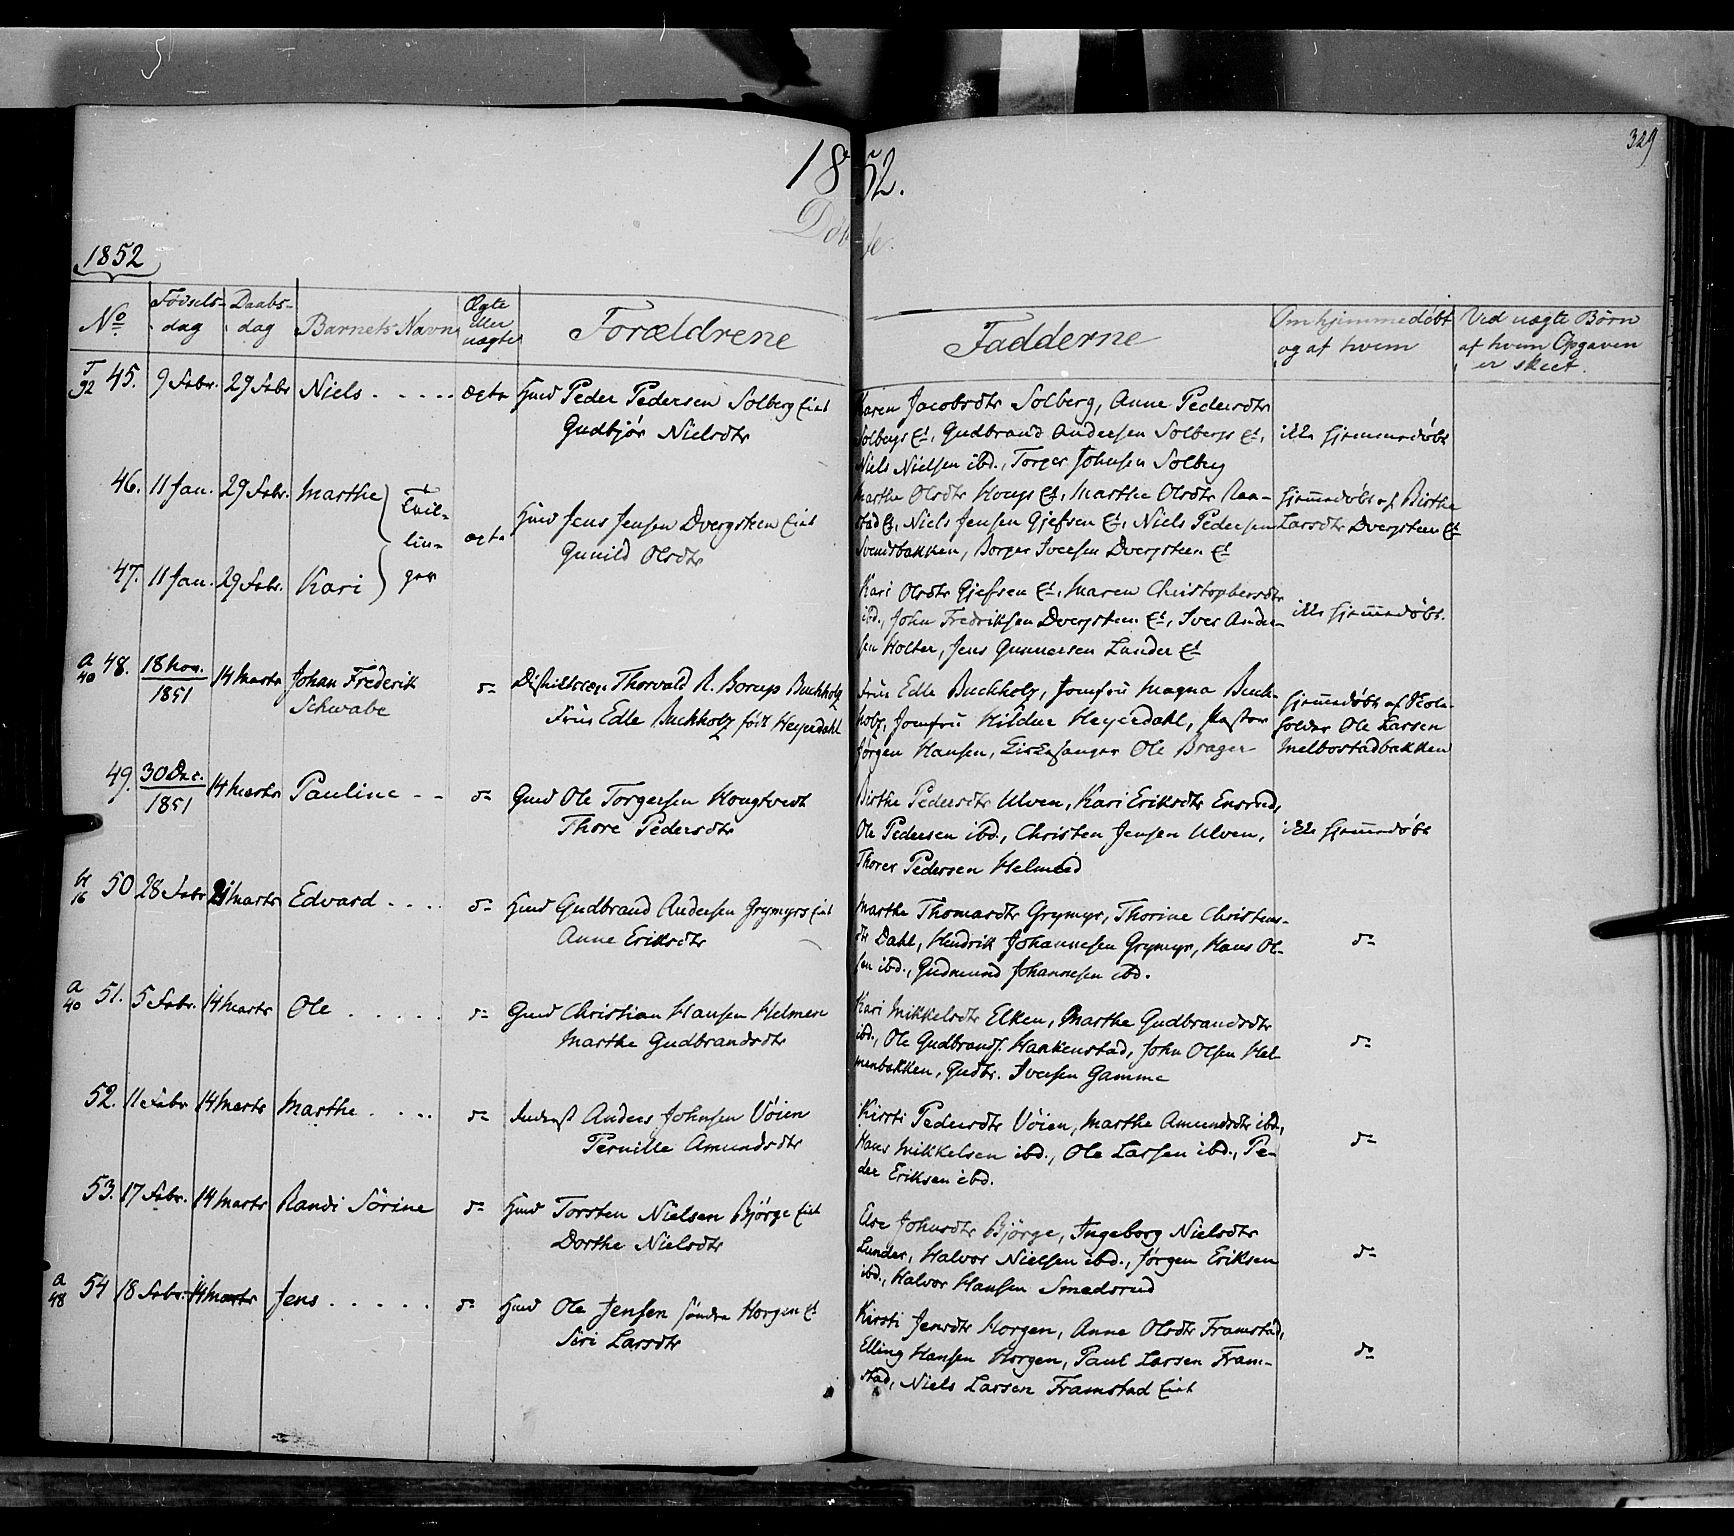 SAH, Gran prestekontor, Ministerialbok nr. 11, 1842-1856, s. 328-329